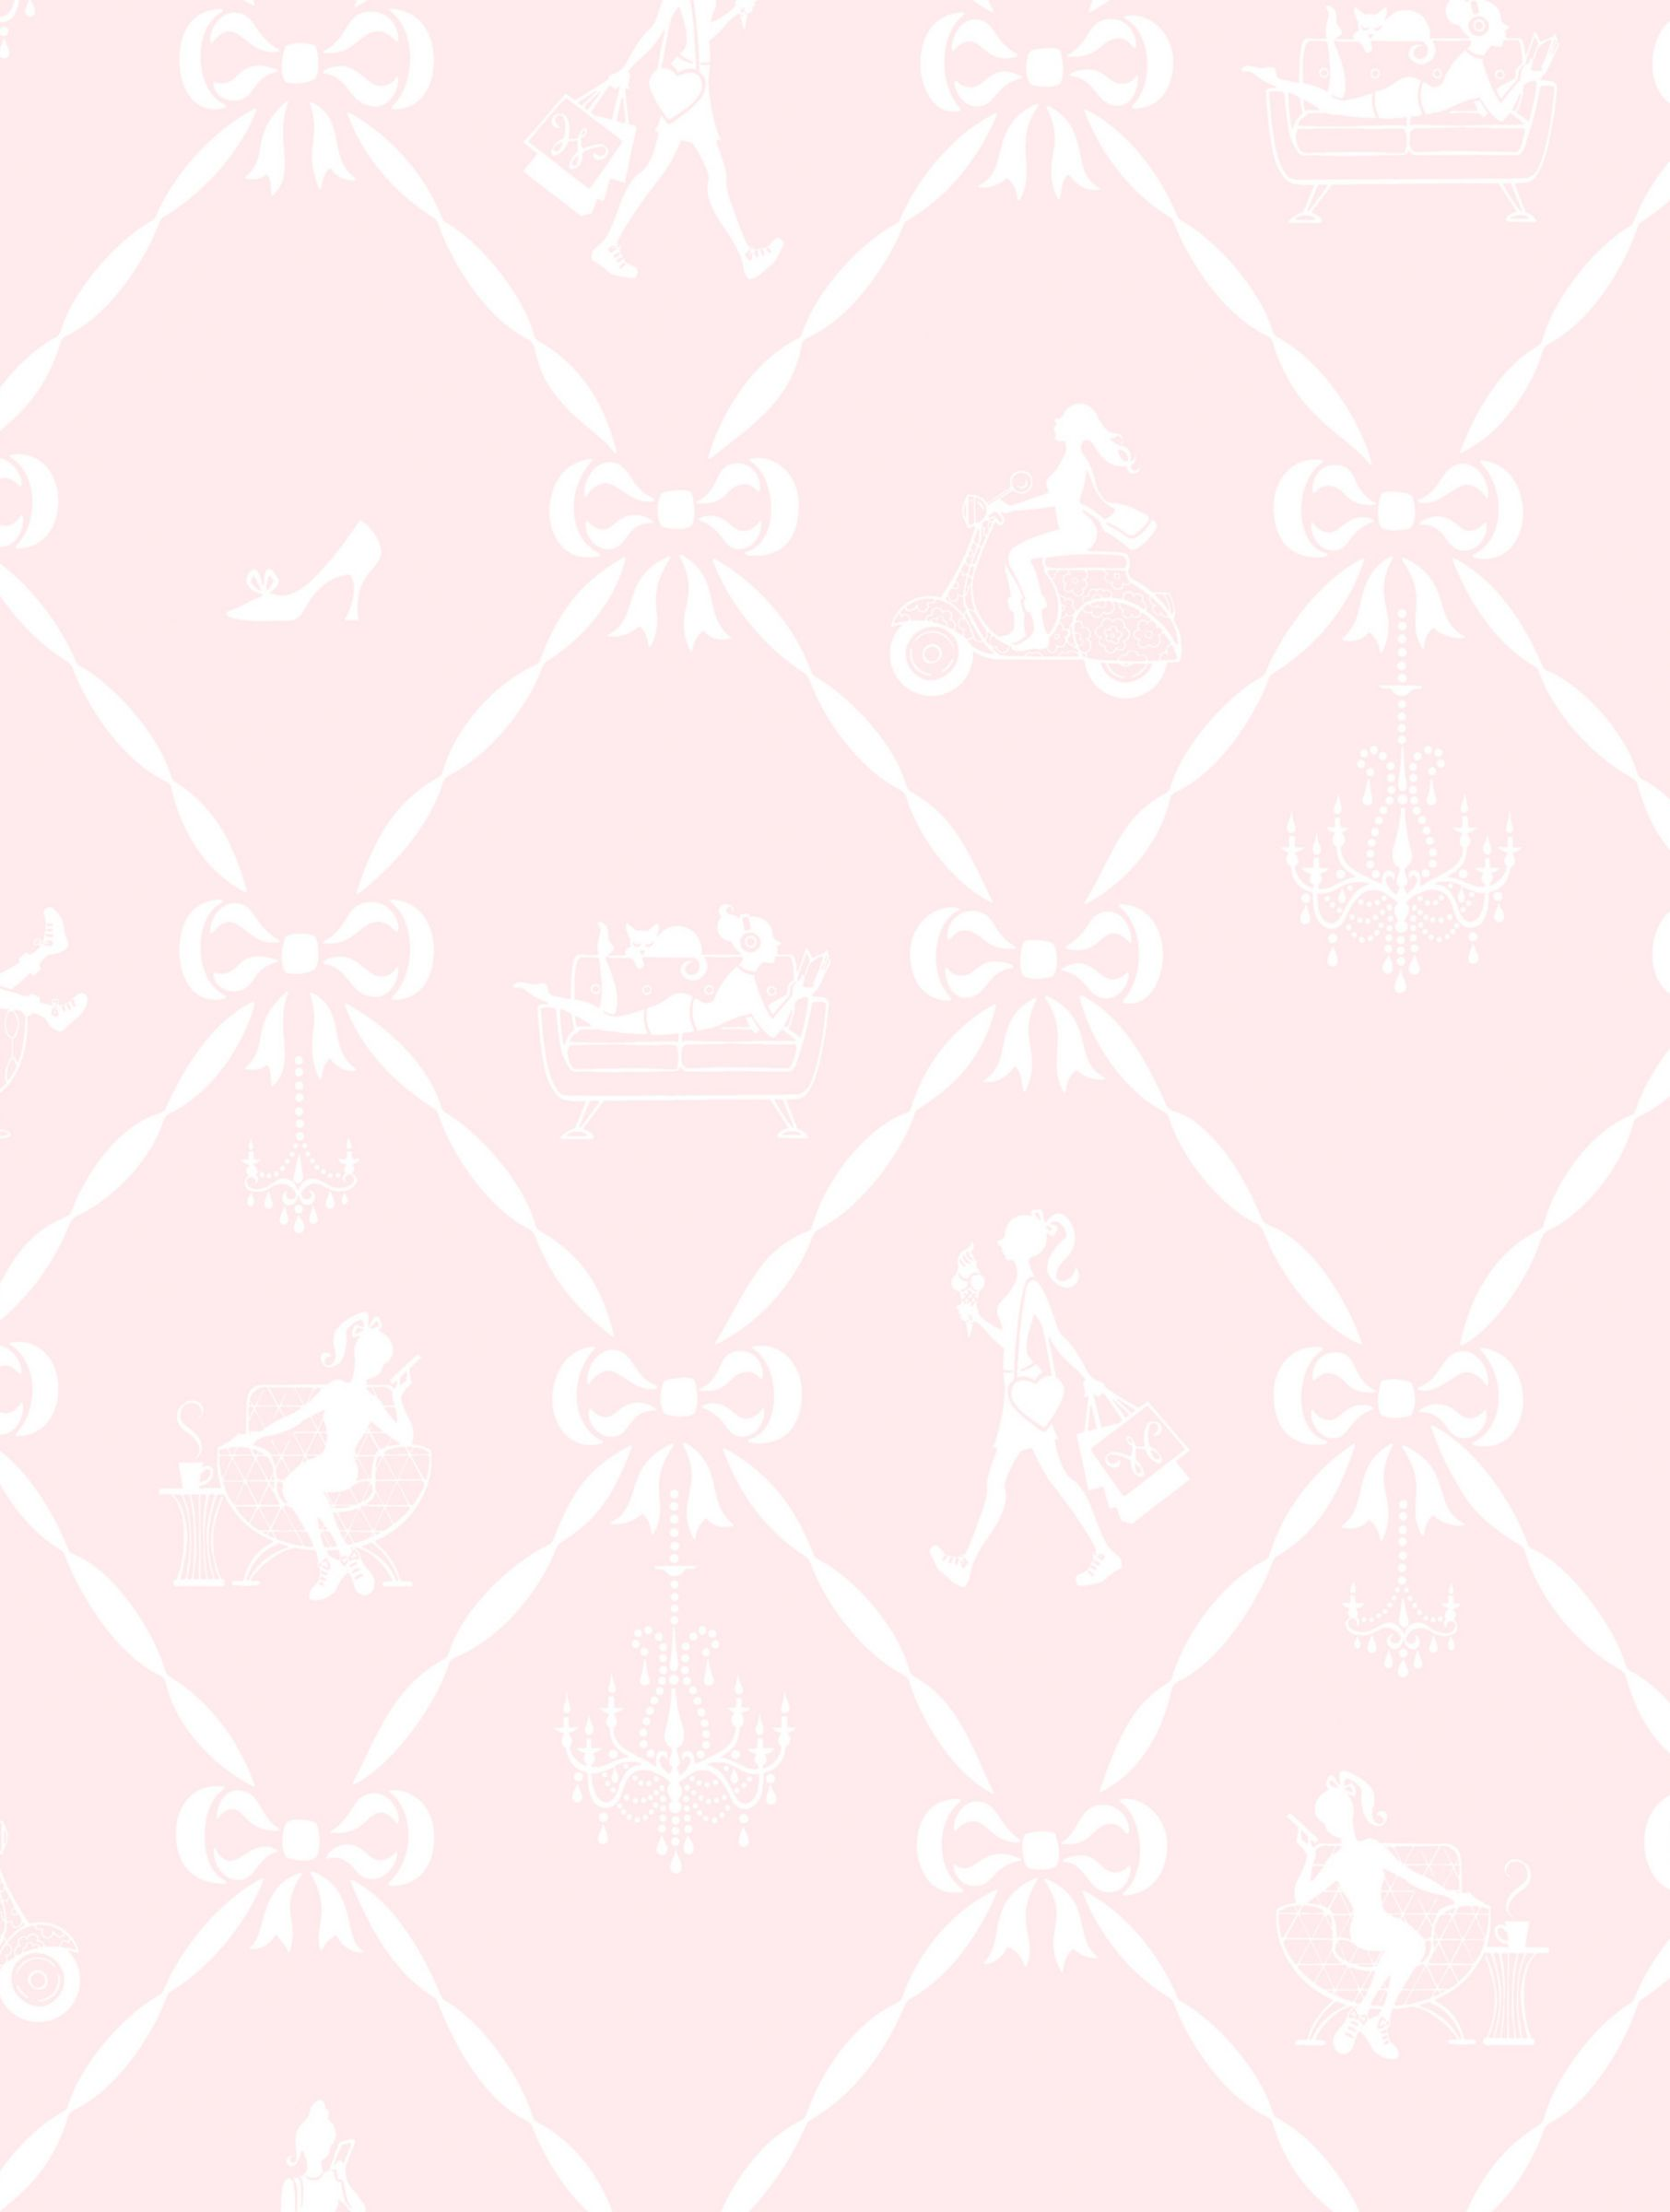 Galerie Galerie Jack n Rose Junior Girls and Bows Wallpaper